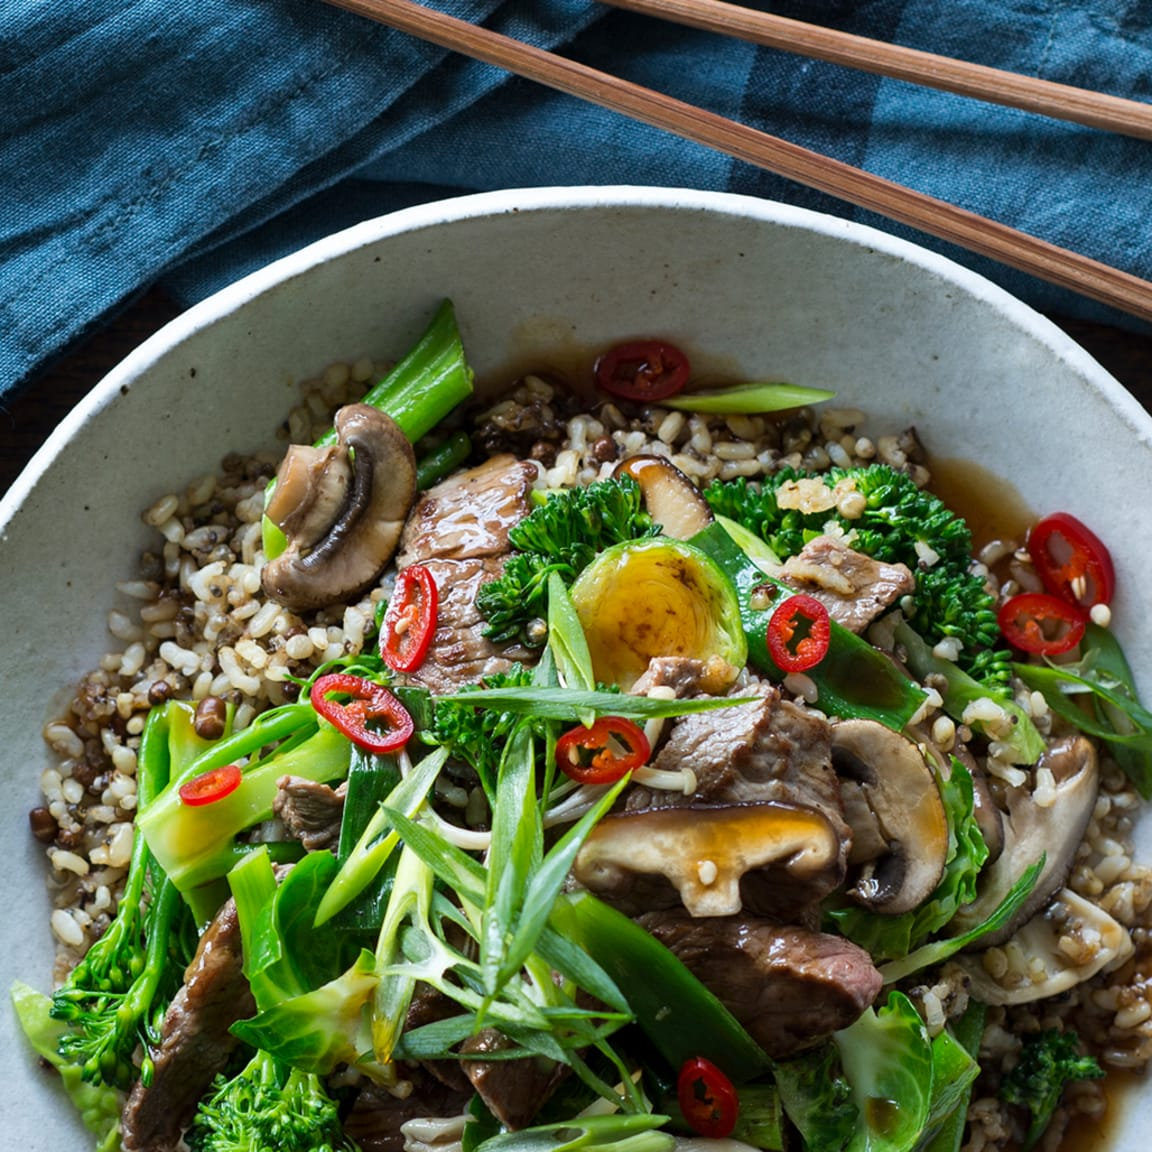 Beef, mushroom & ancient grain stir-fry